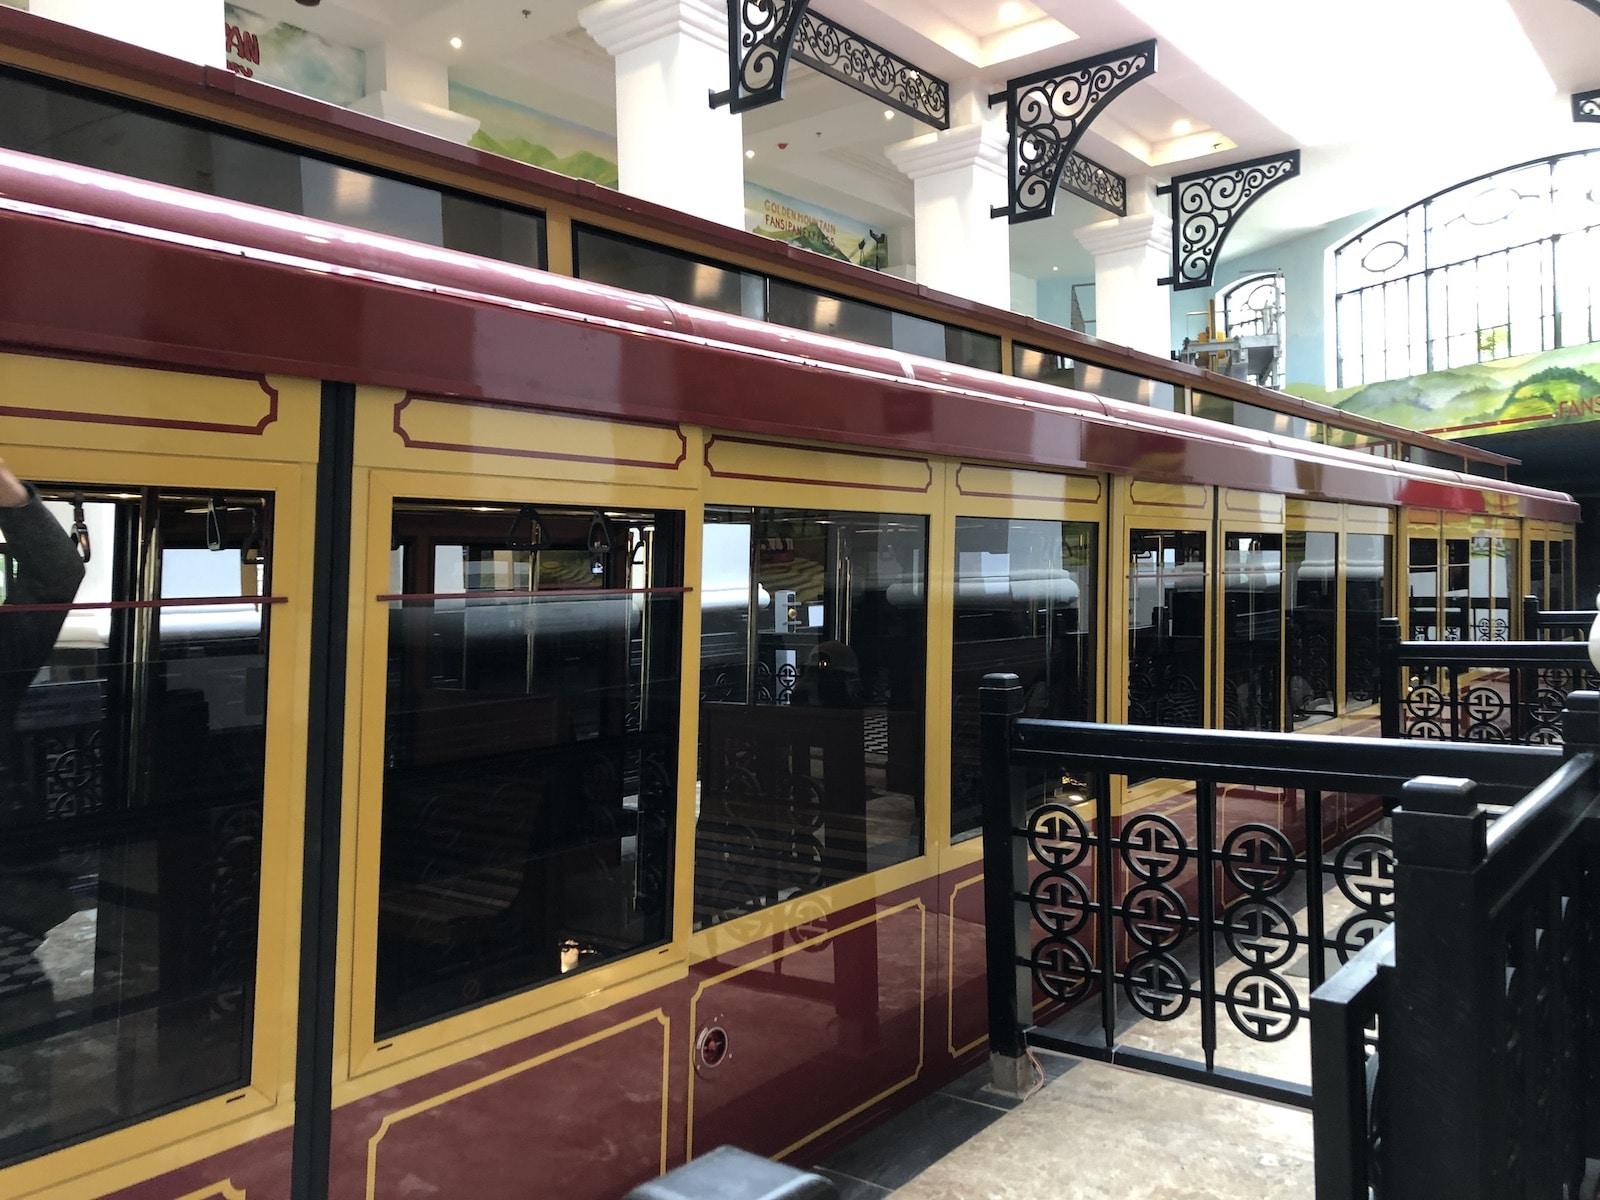 Boarding the Sapa Tram to Fansipan